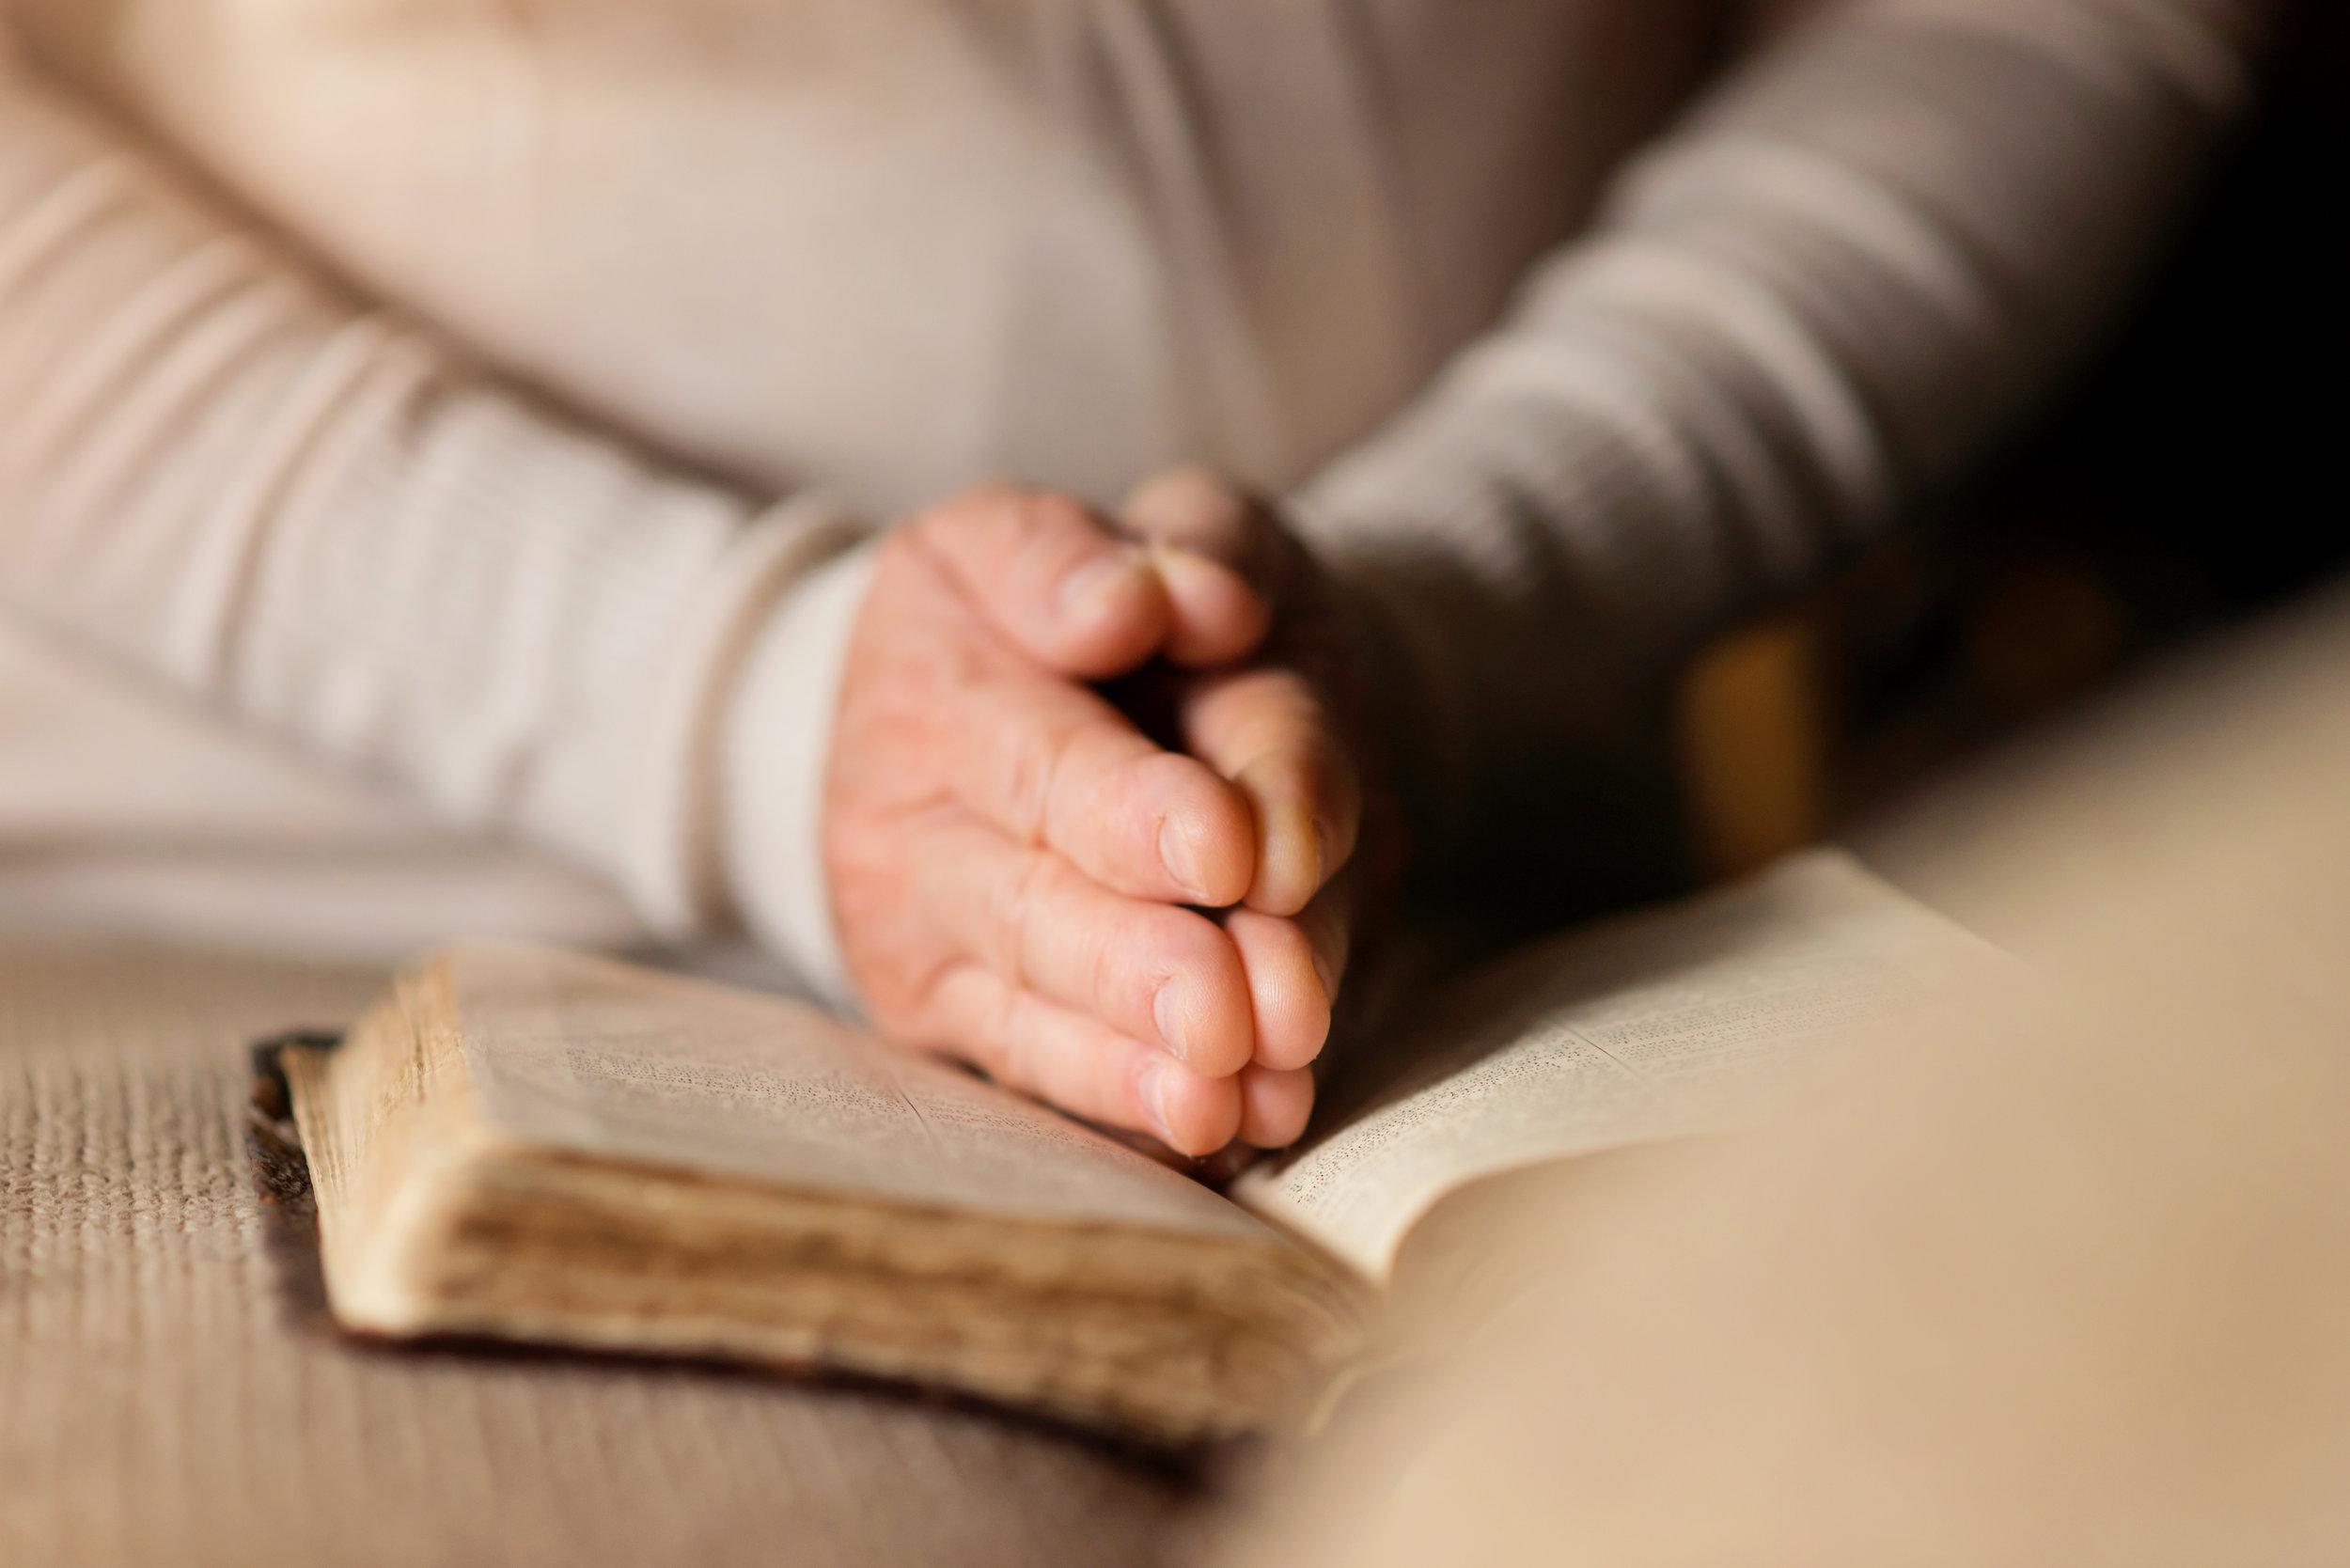 woman-with-bible-PDUGGZV.jpg